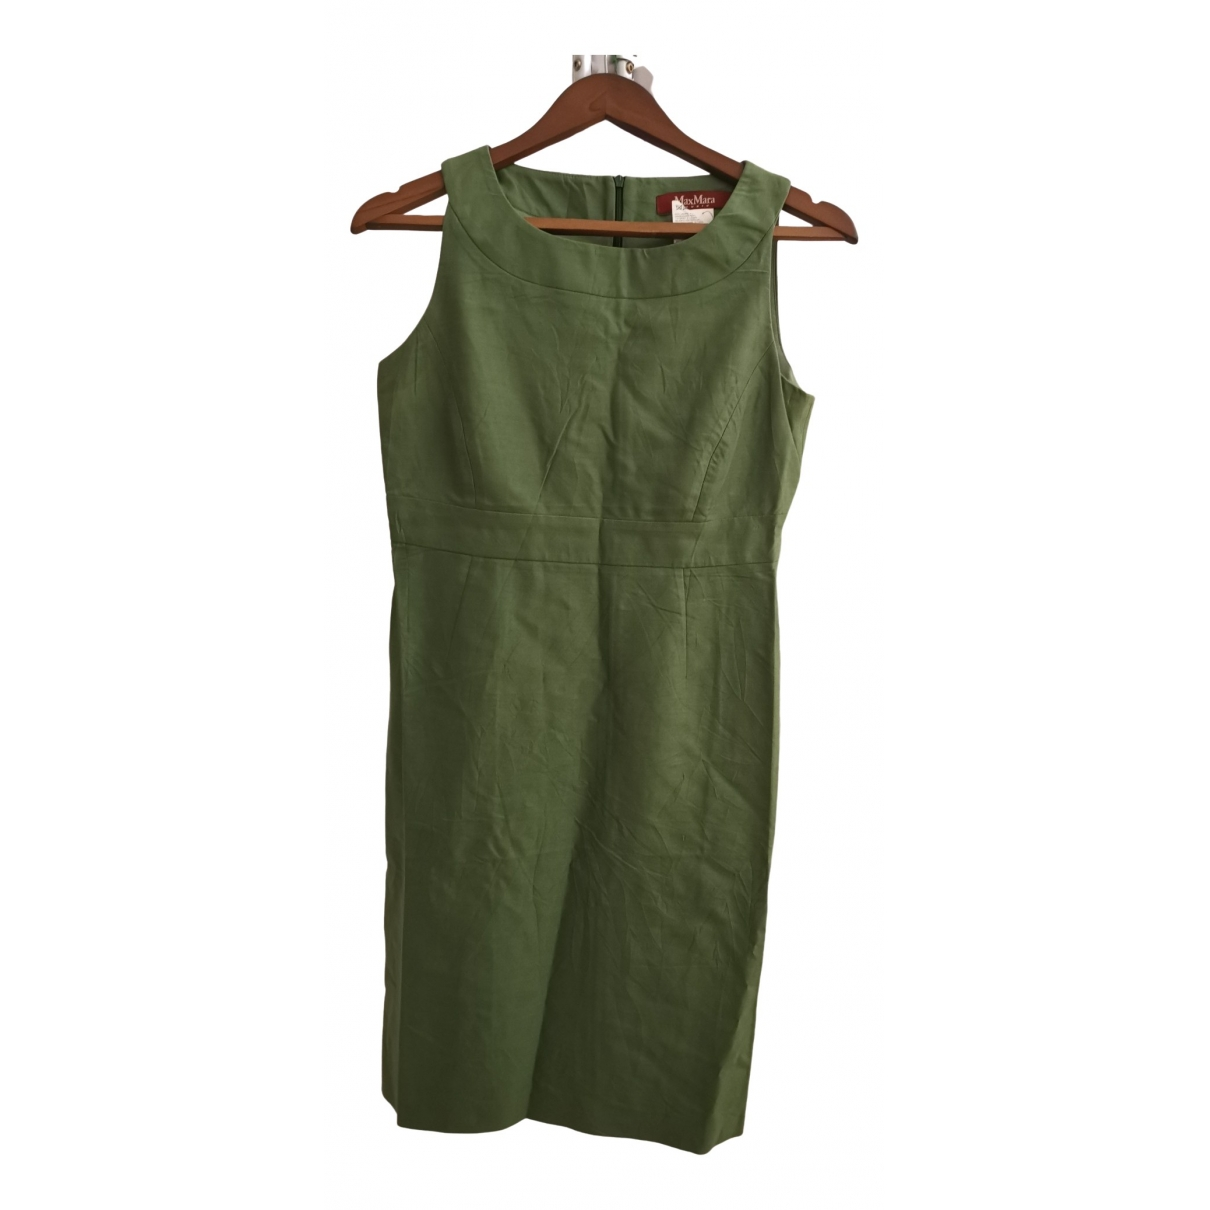 Max Mara Studio \N Green Cotton dress for Women 38 FR